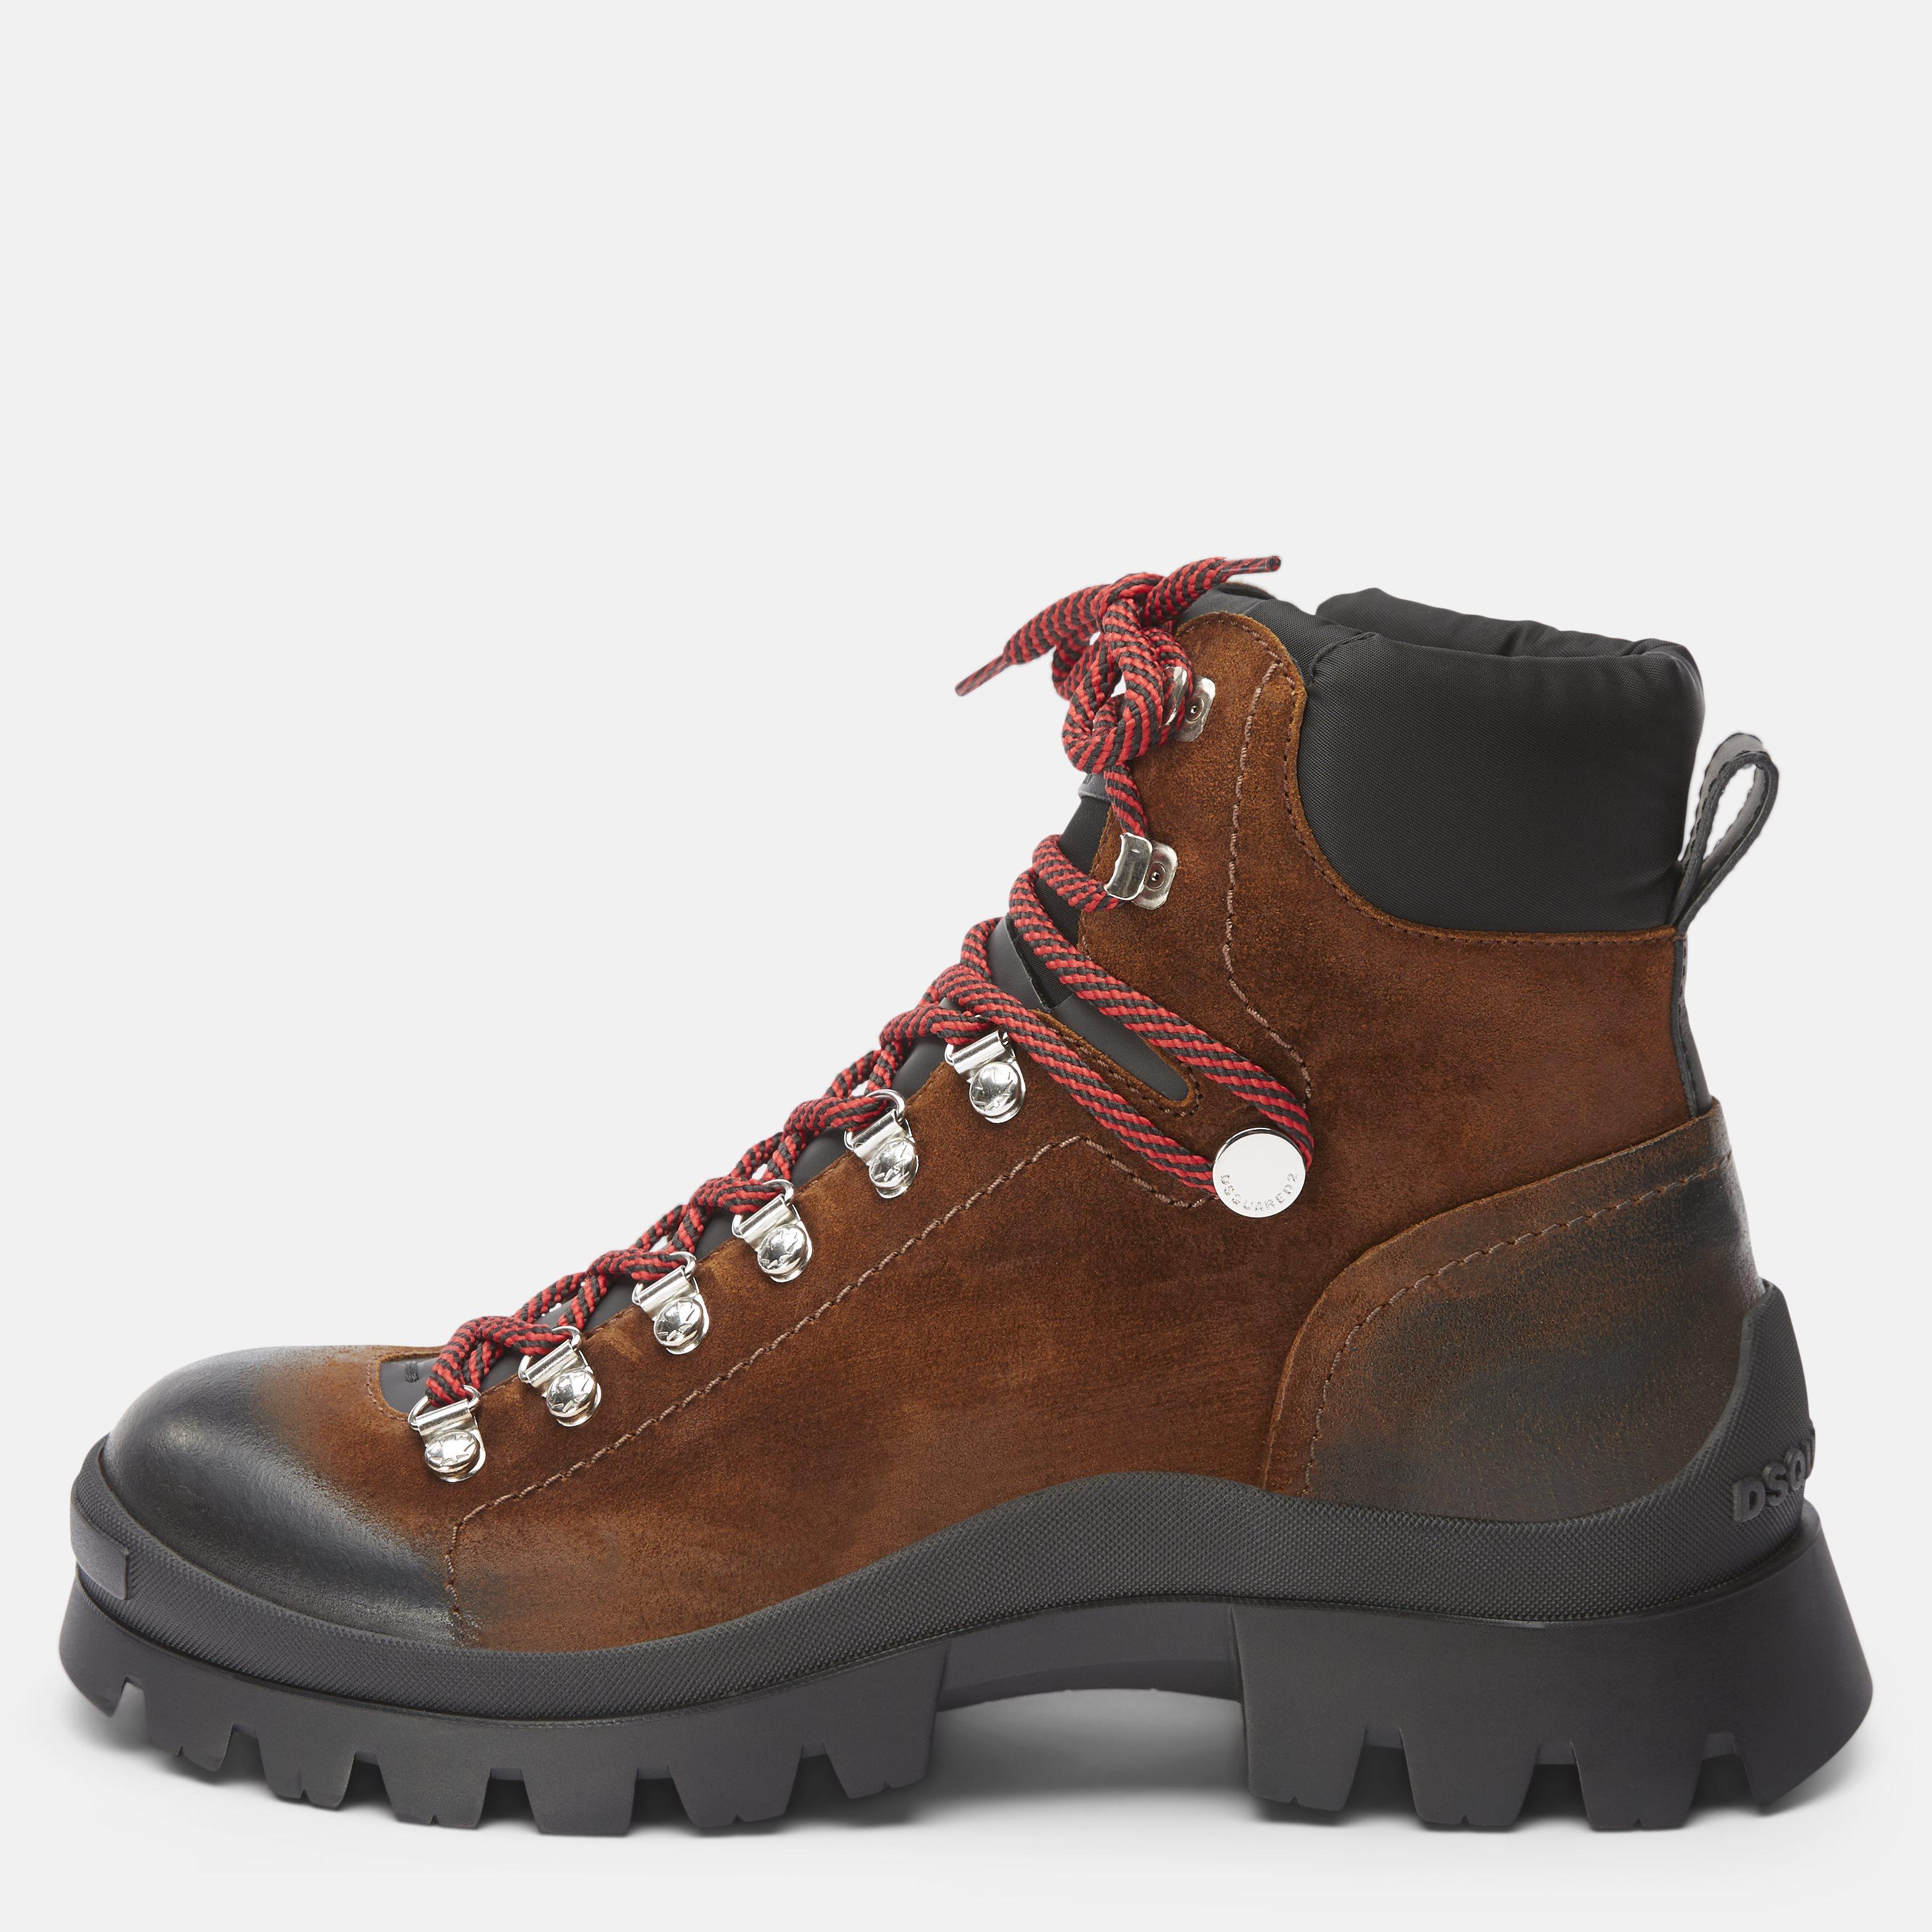 Tank Hiking Boot - Sko - Brun